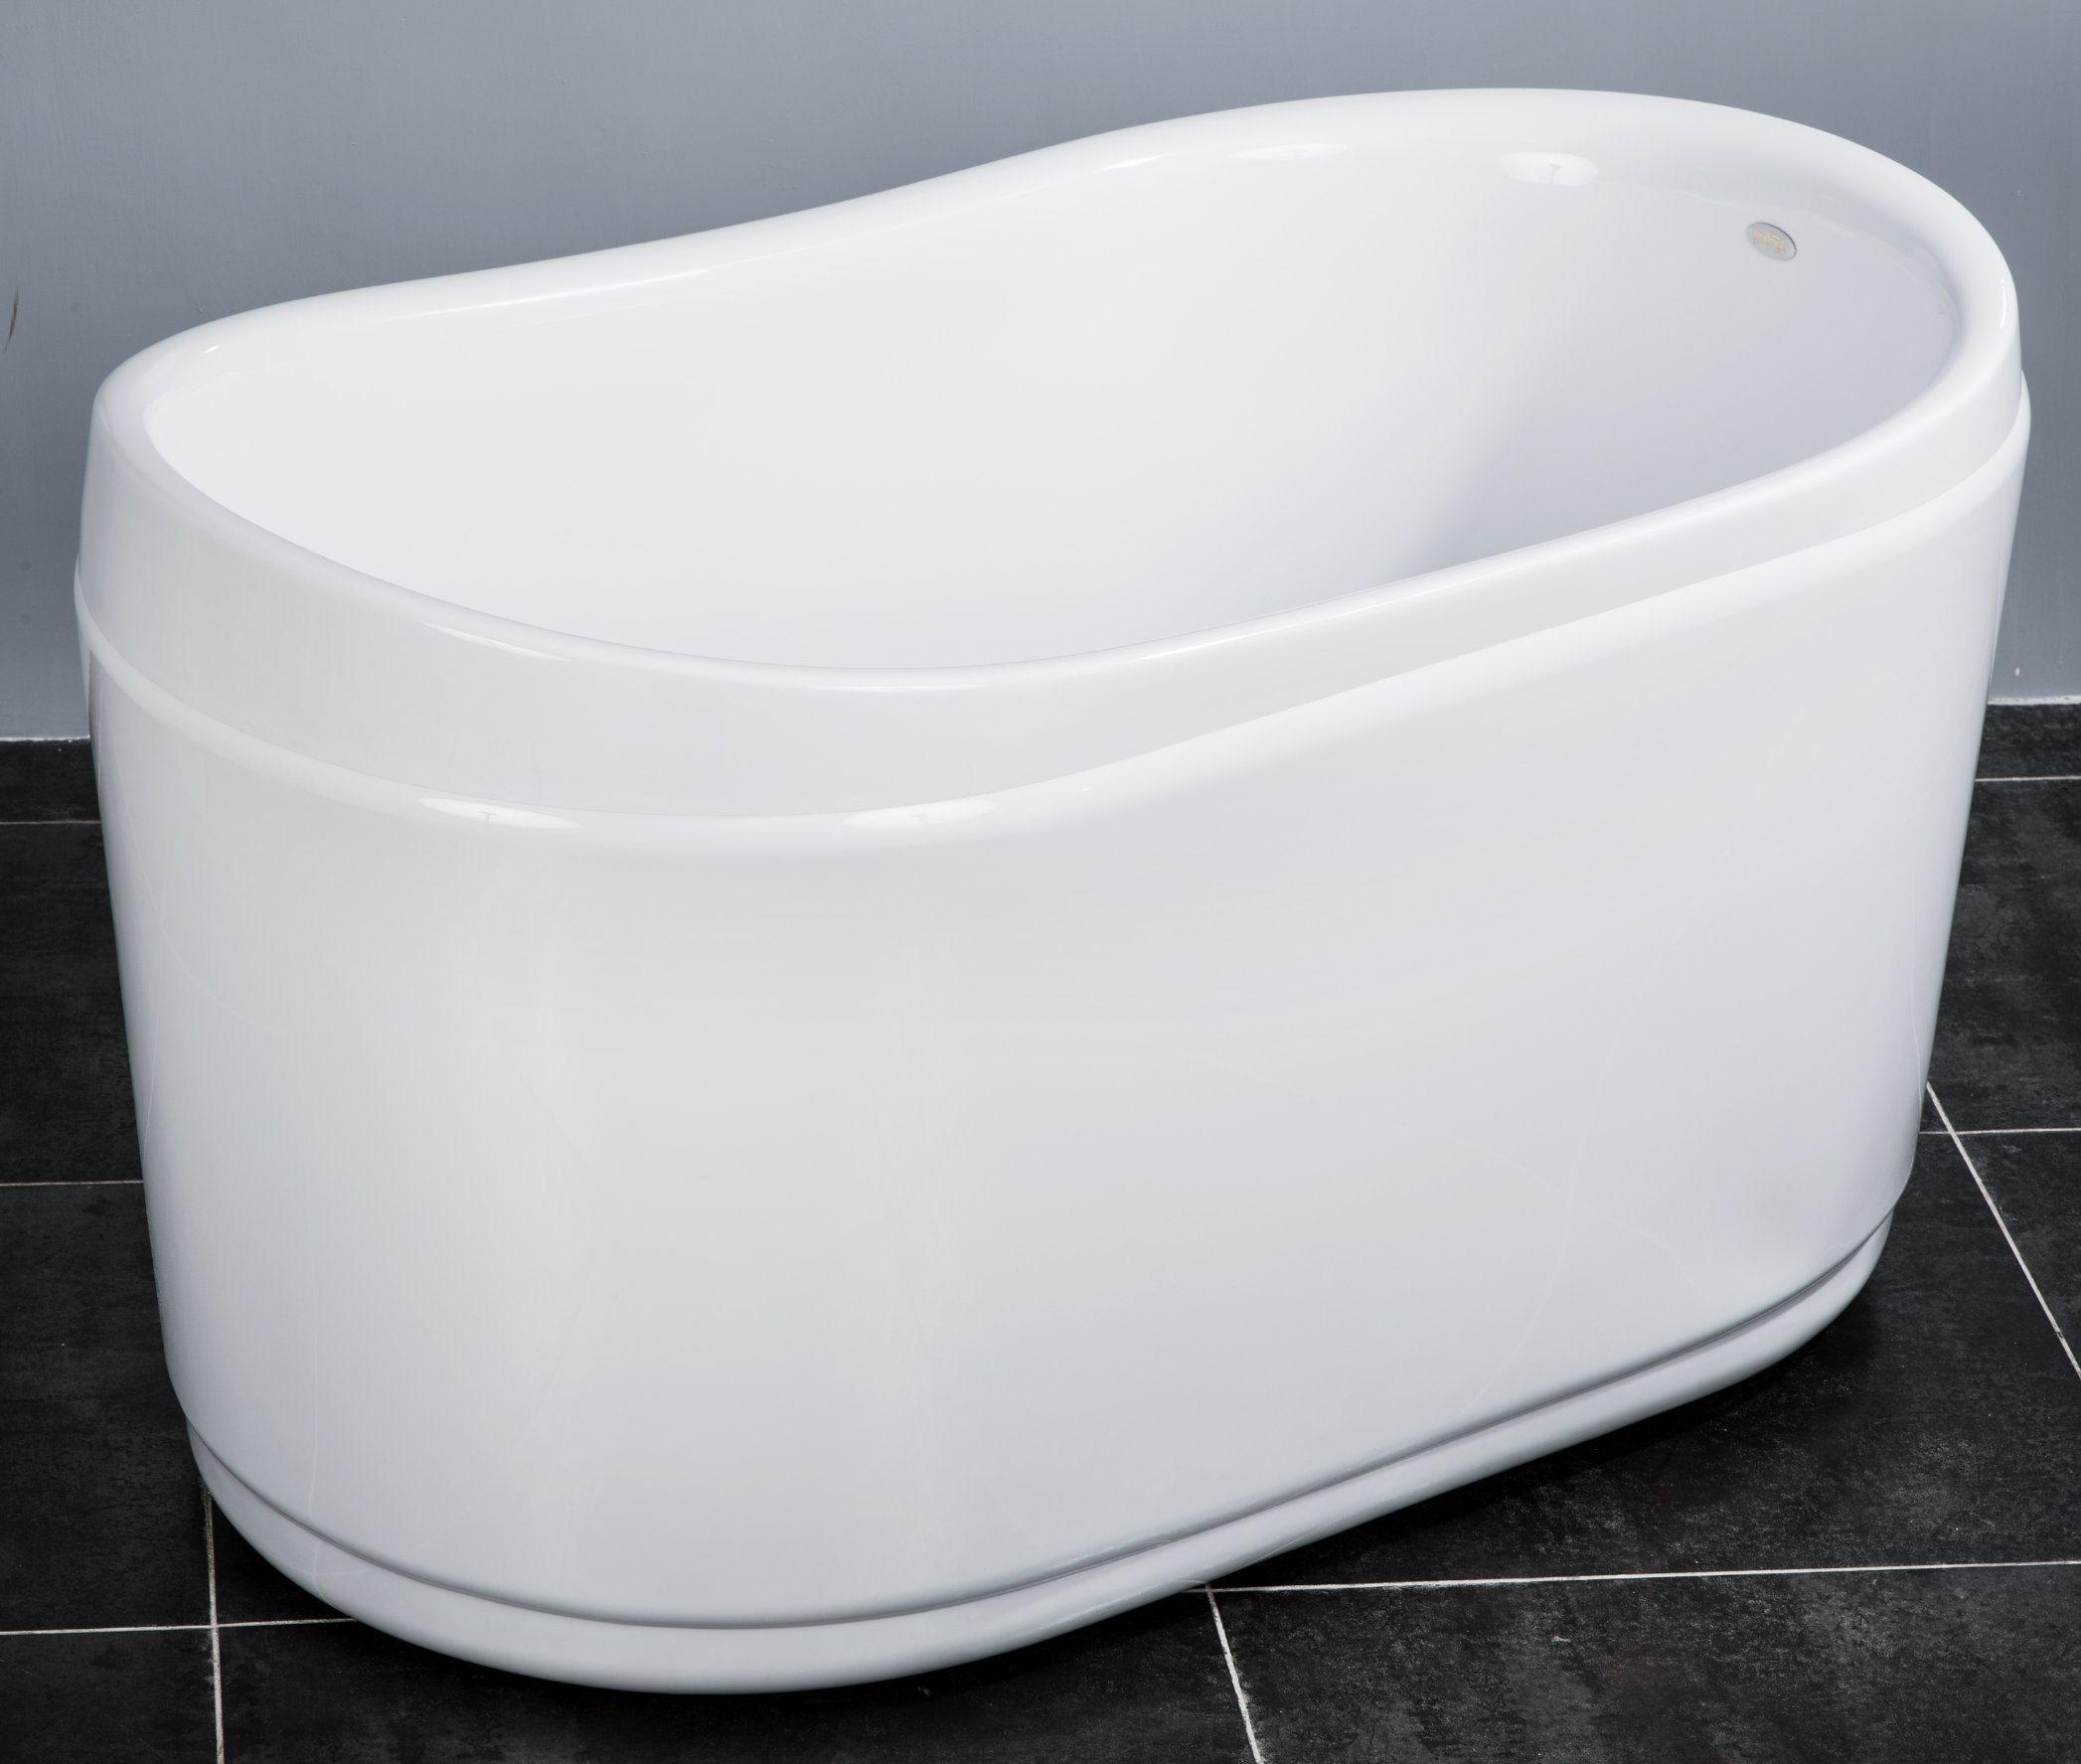 China Very Small Bathtubs Cheap Acrylic Freestanding Bathtub Photos ...